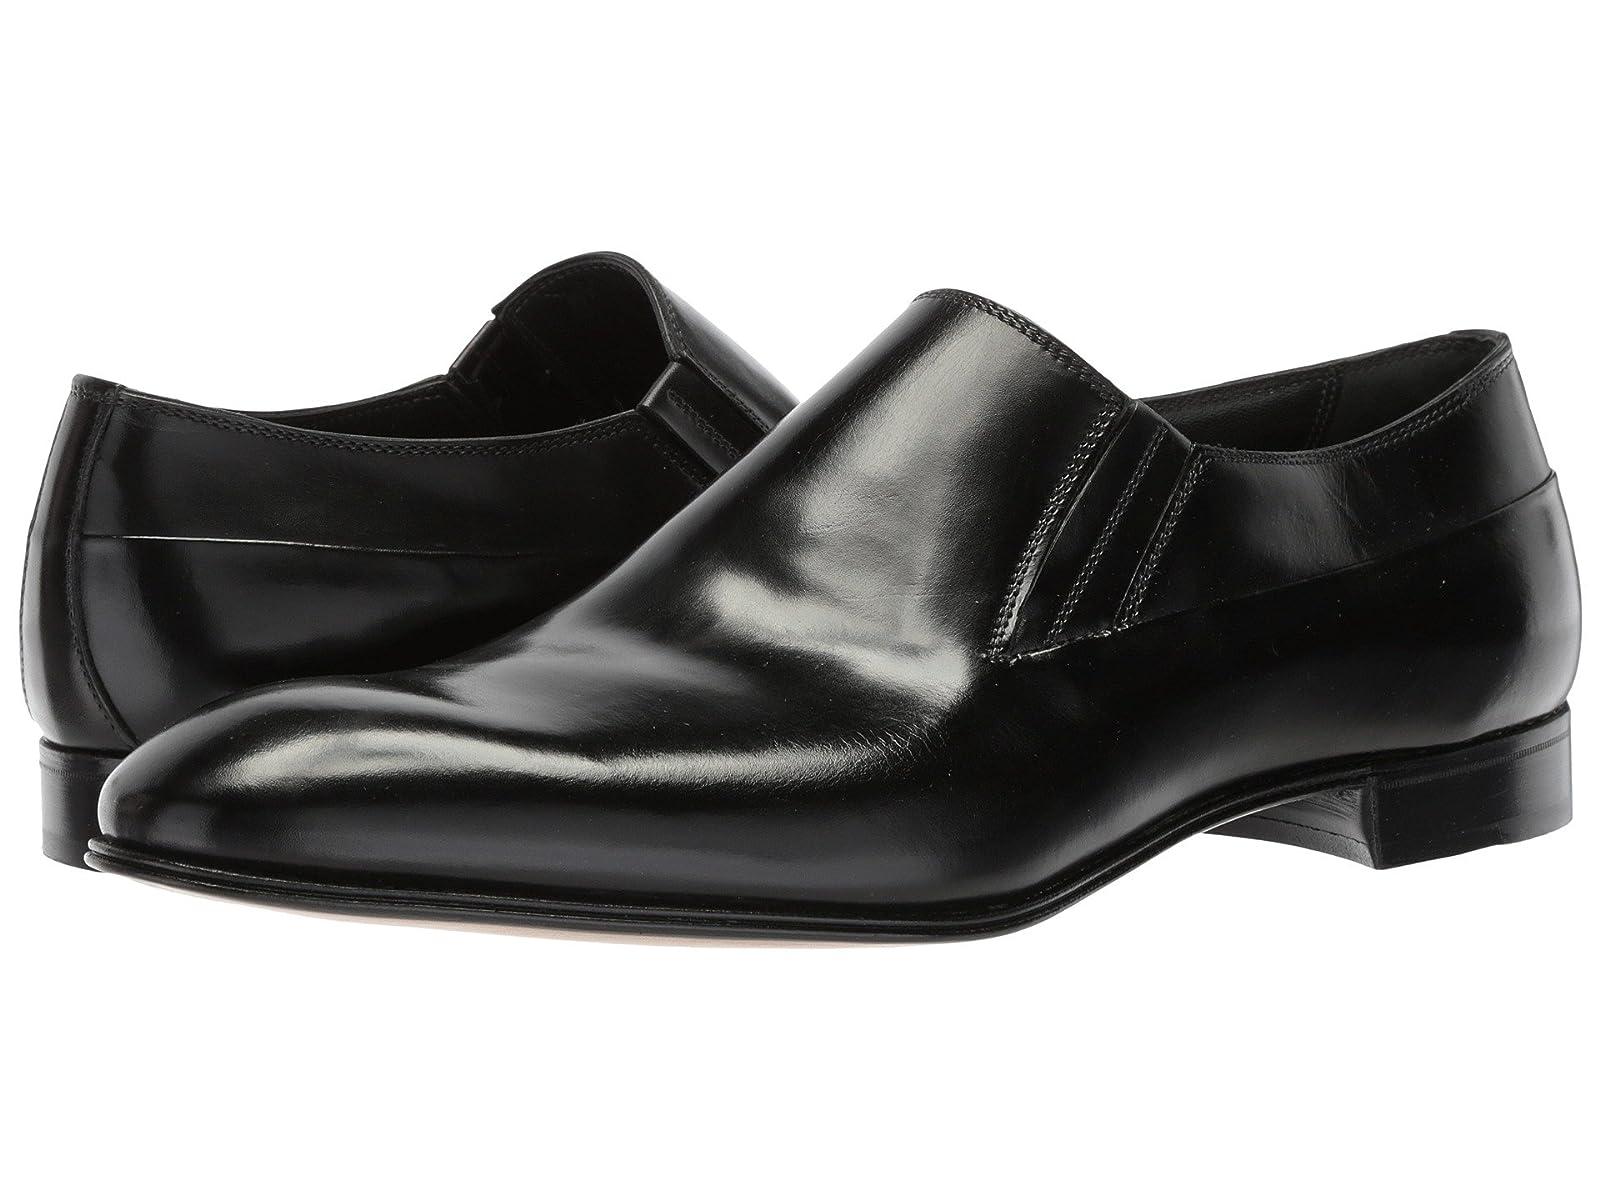 Gravati Plain Toe Slip-OnAtmospheric grades have affordable shoes